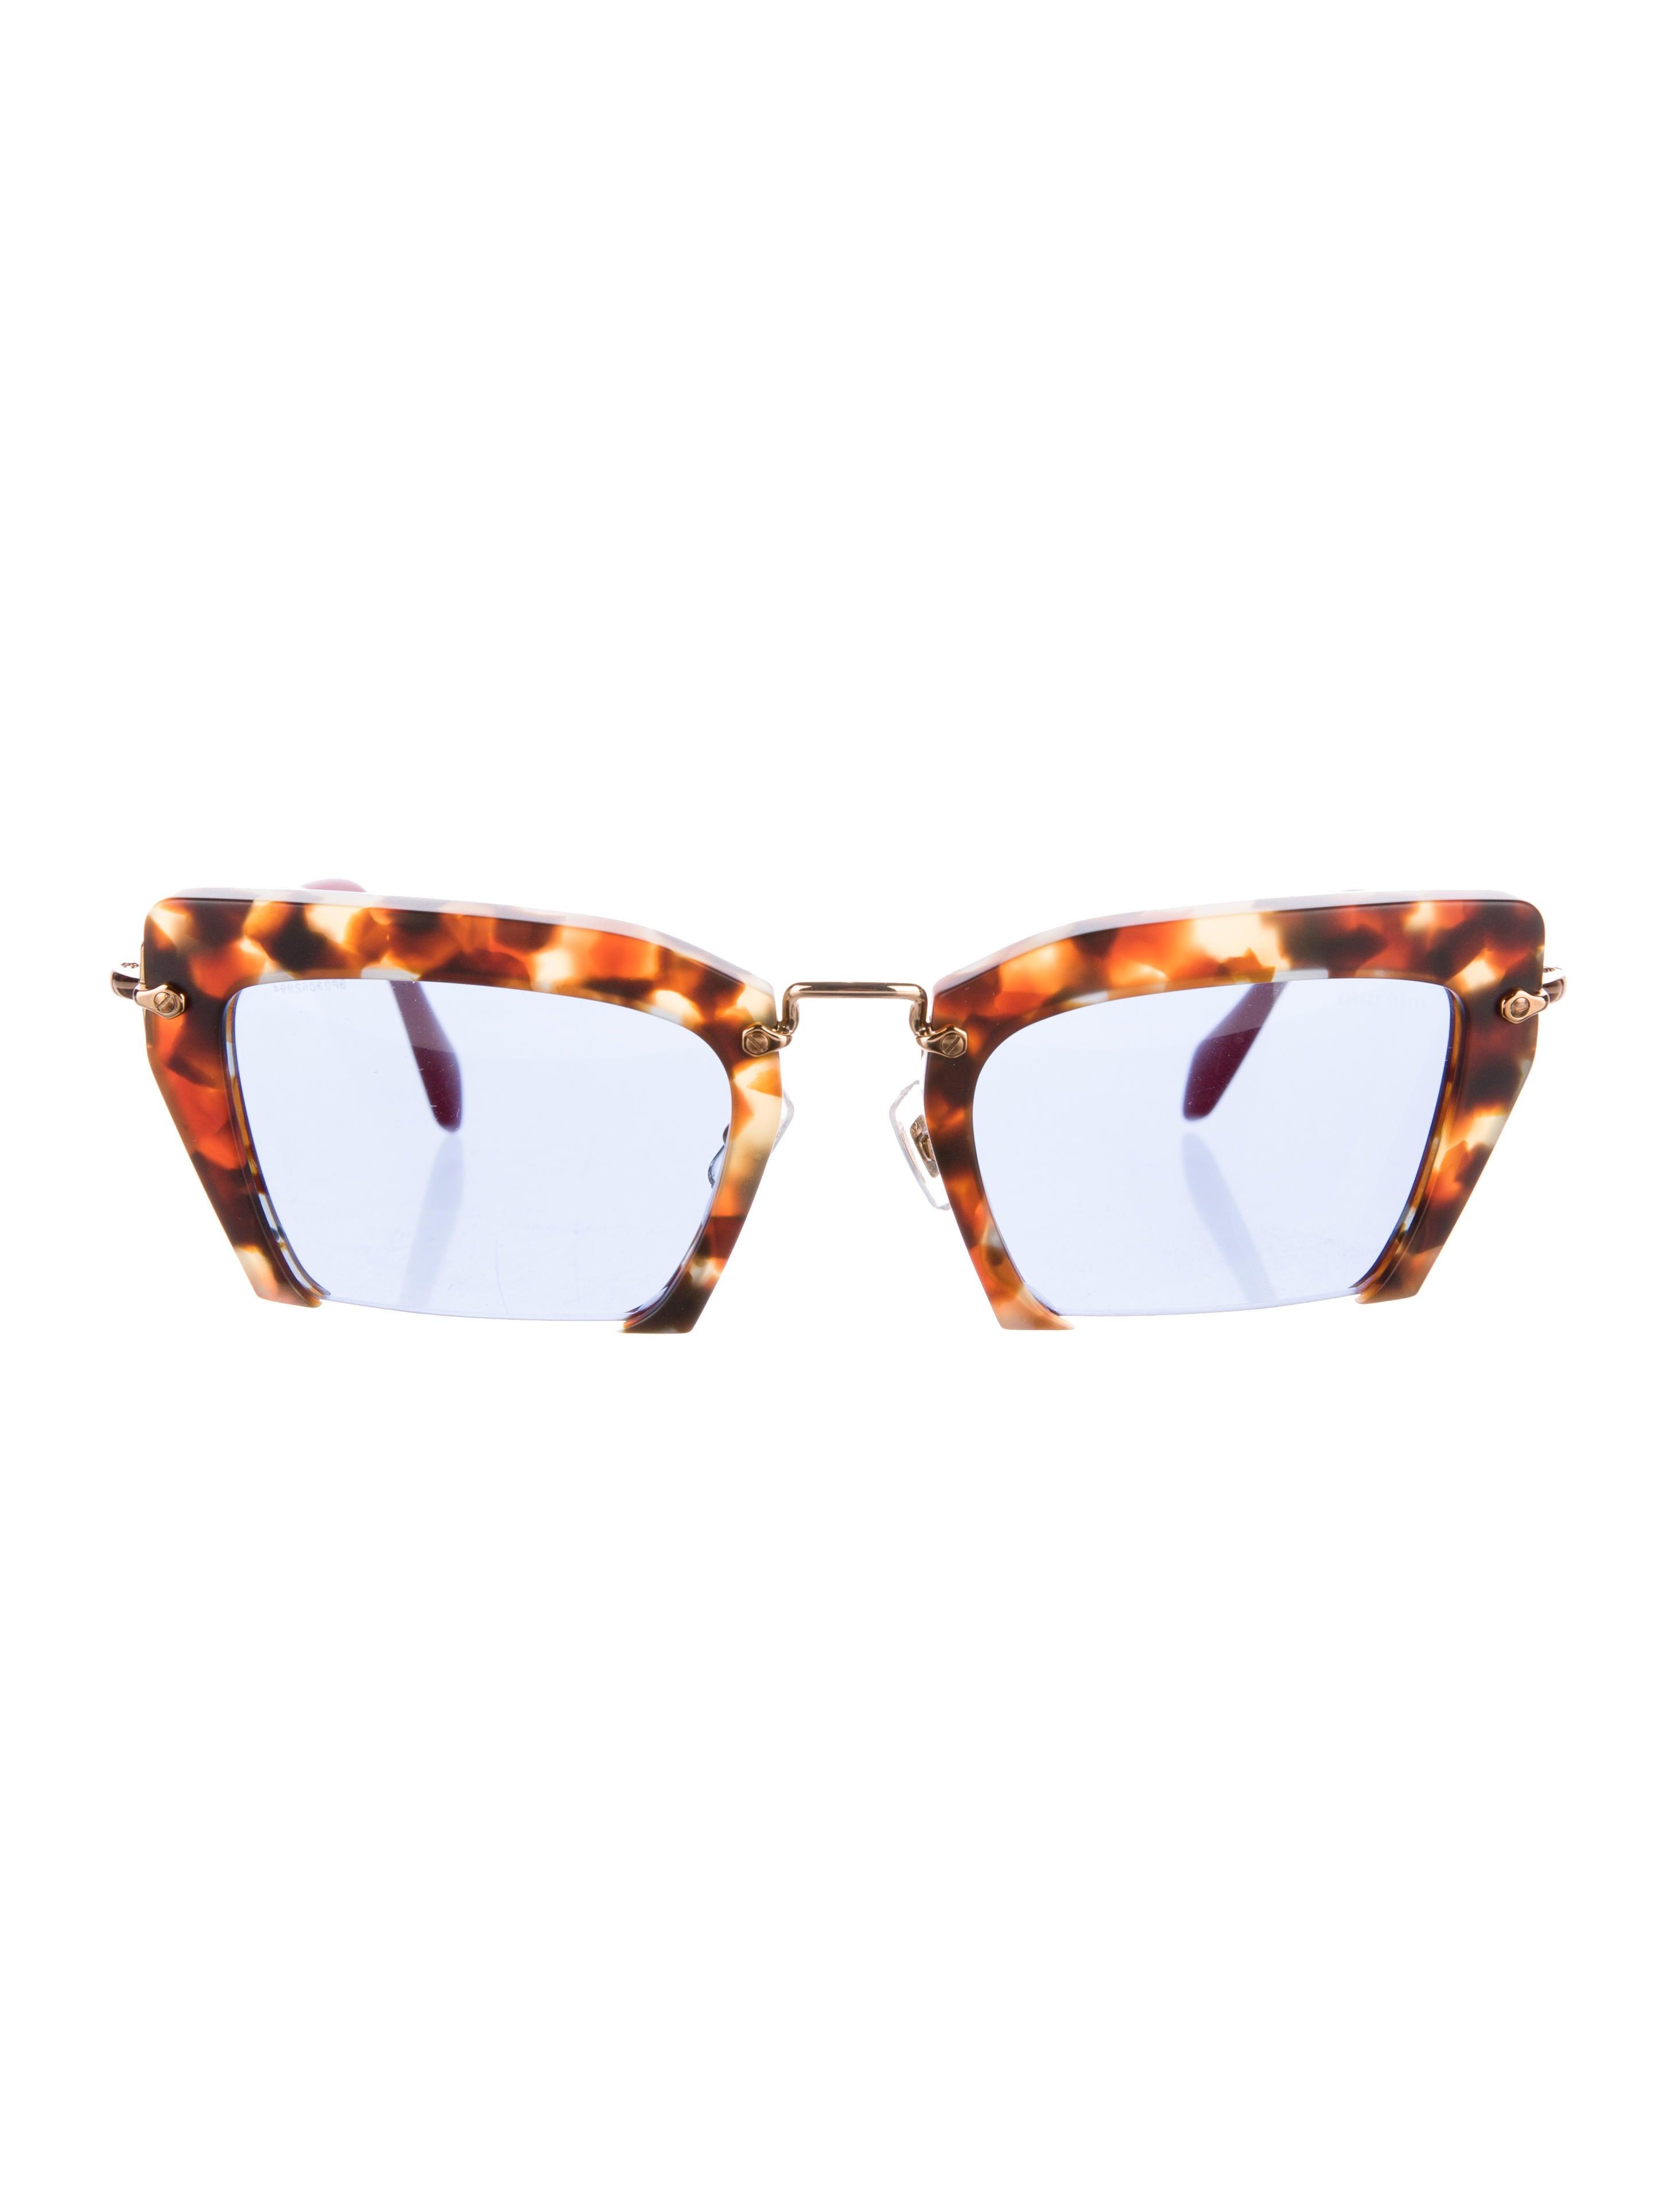 f1ac8a7e4730 Miu Miu Tortoiseshell Raisor Sunglasses - Accessories - MIU41027 ...